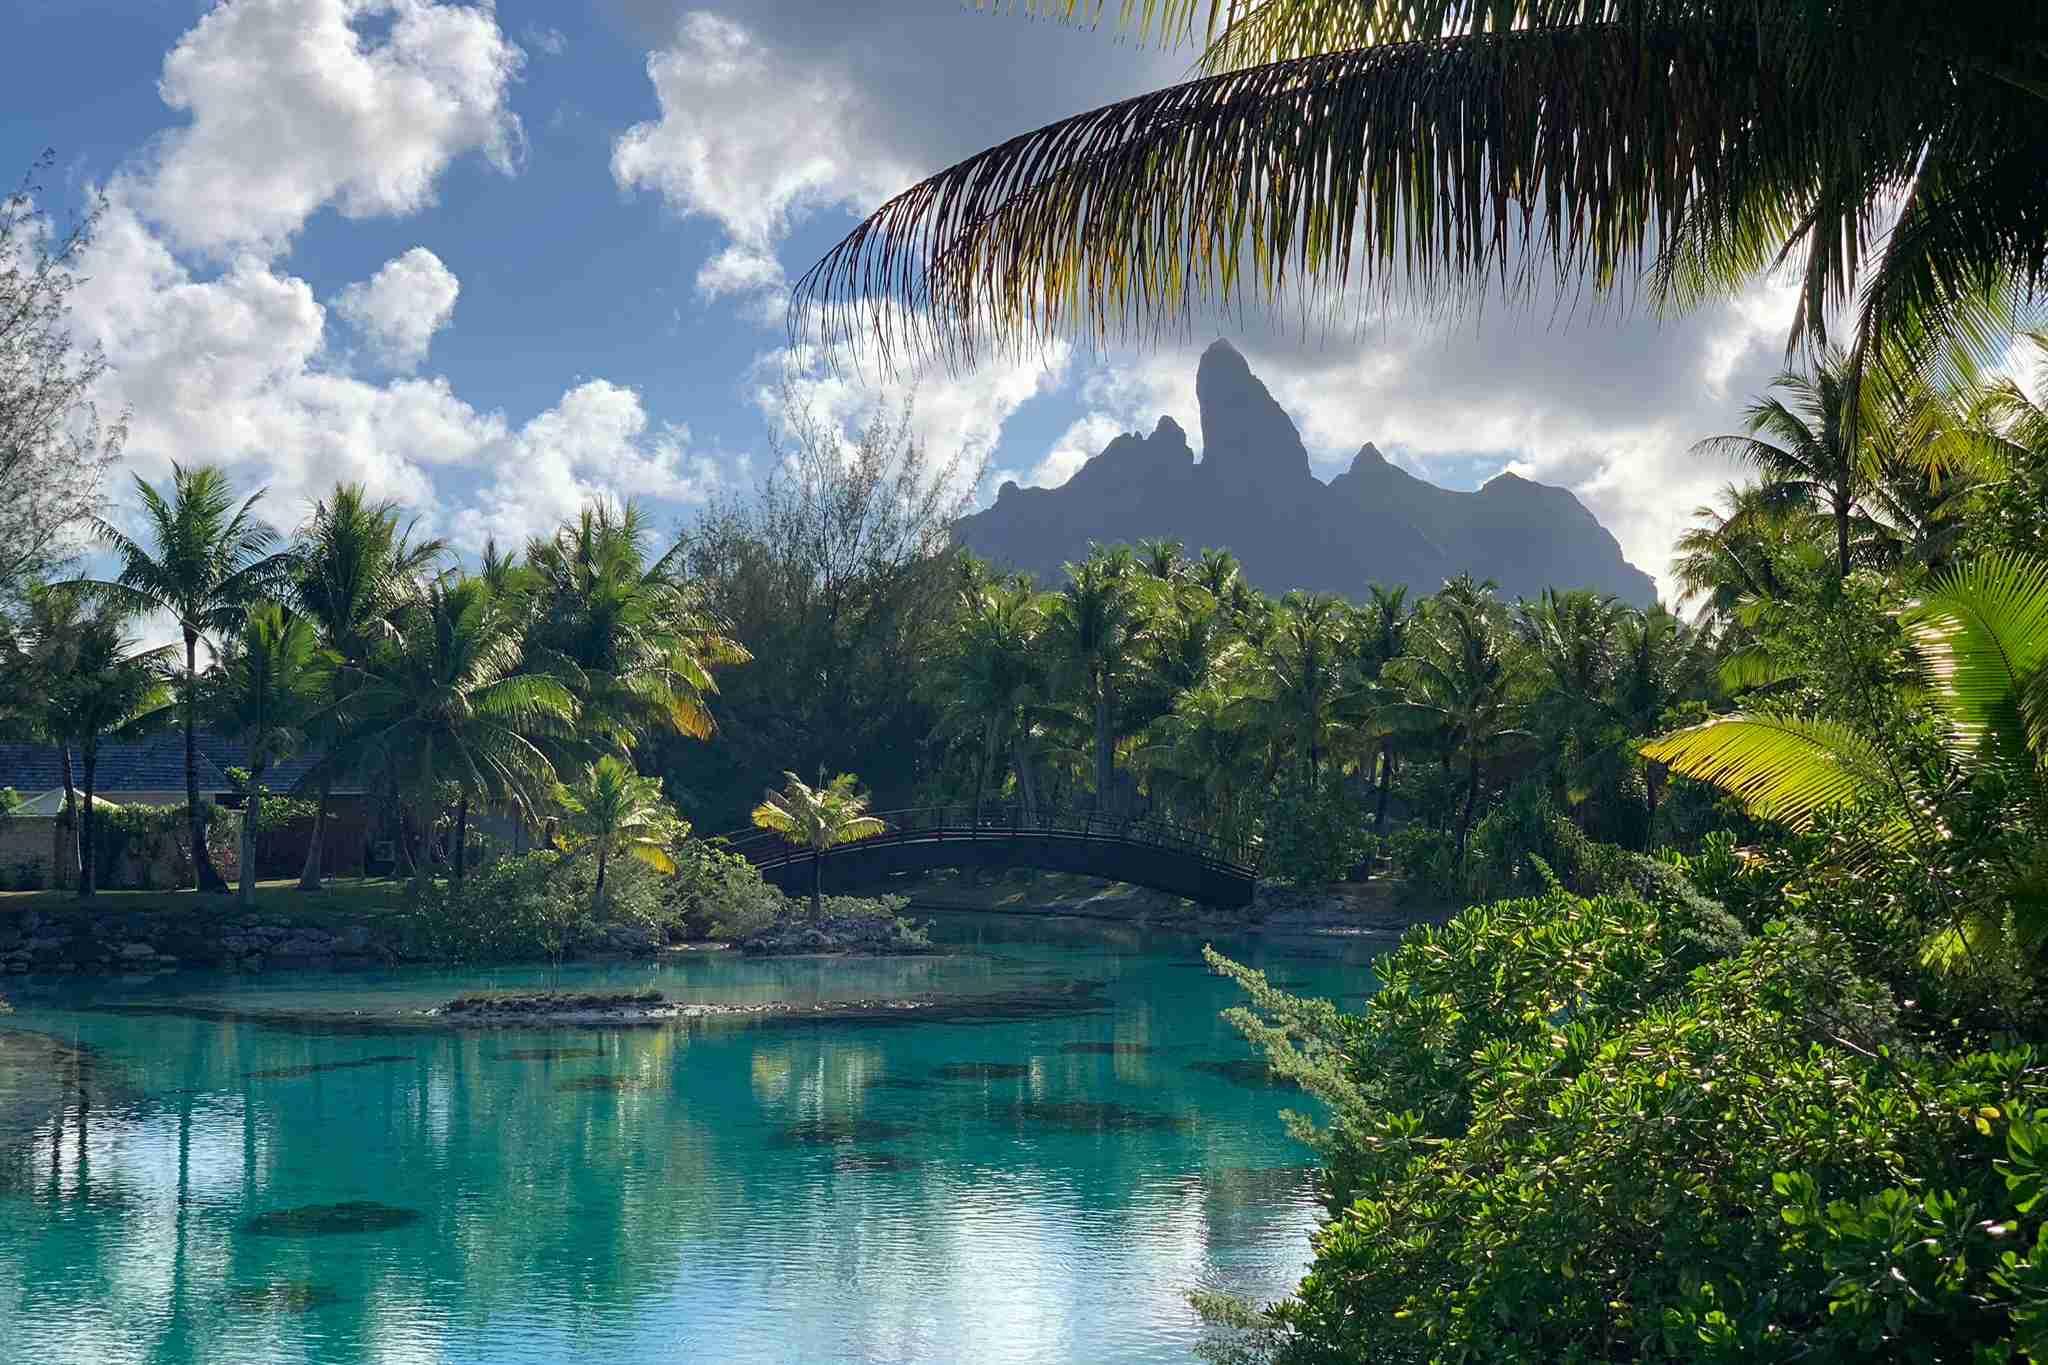 Breakfast in this idyllic Bora Bora setting? Yes, please. (Photo by Zach Honig / The Points Guy)